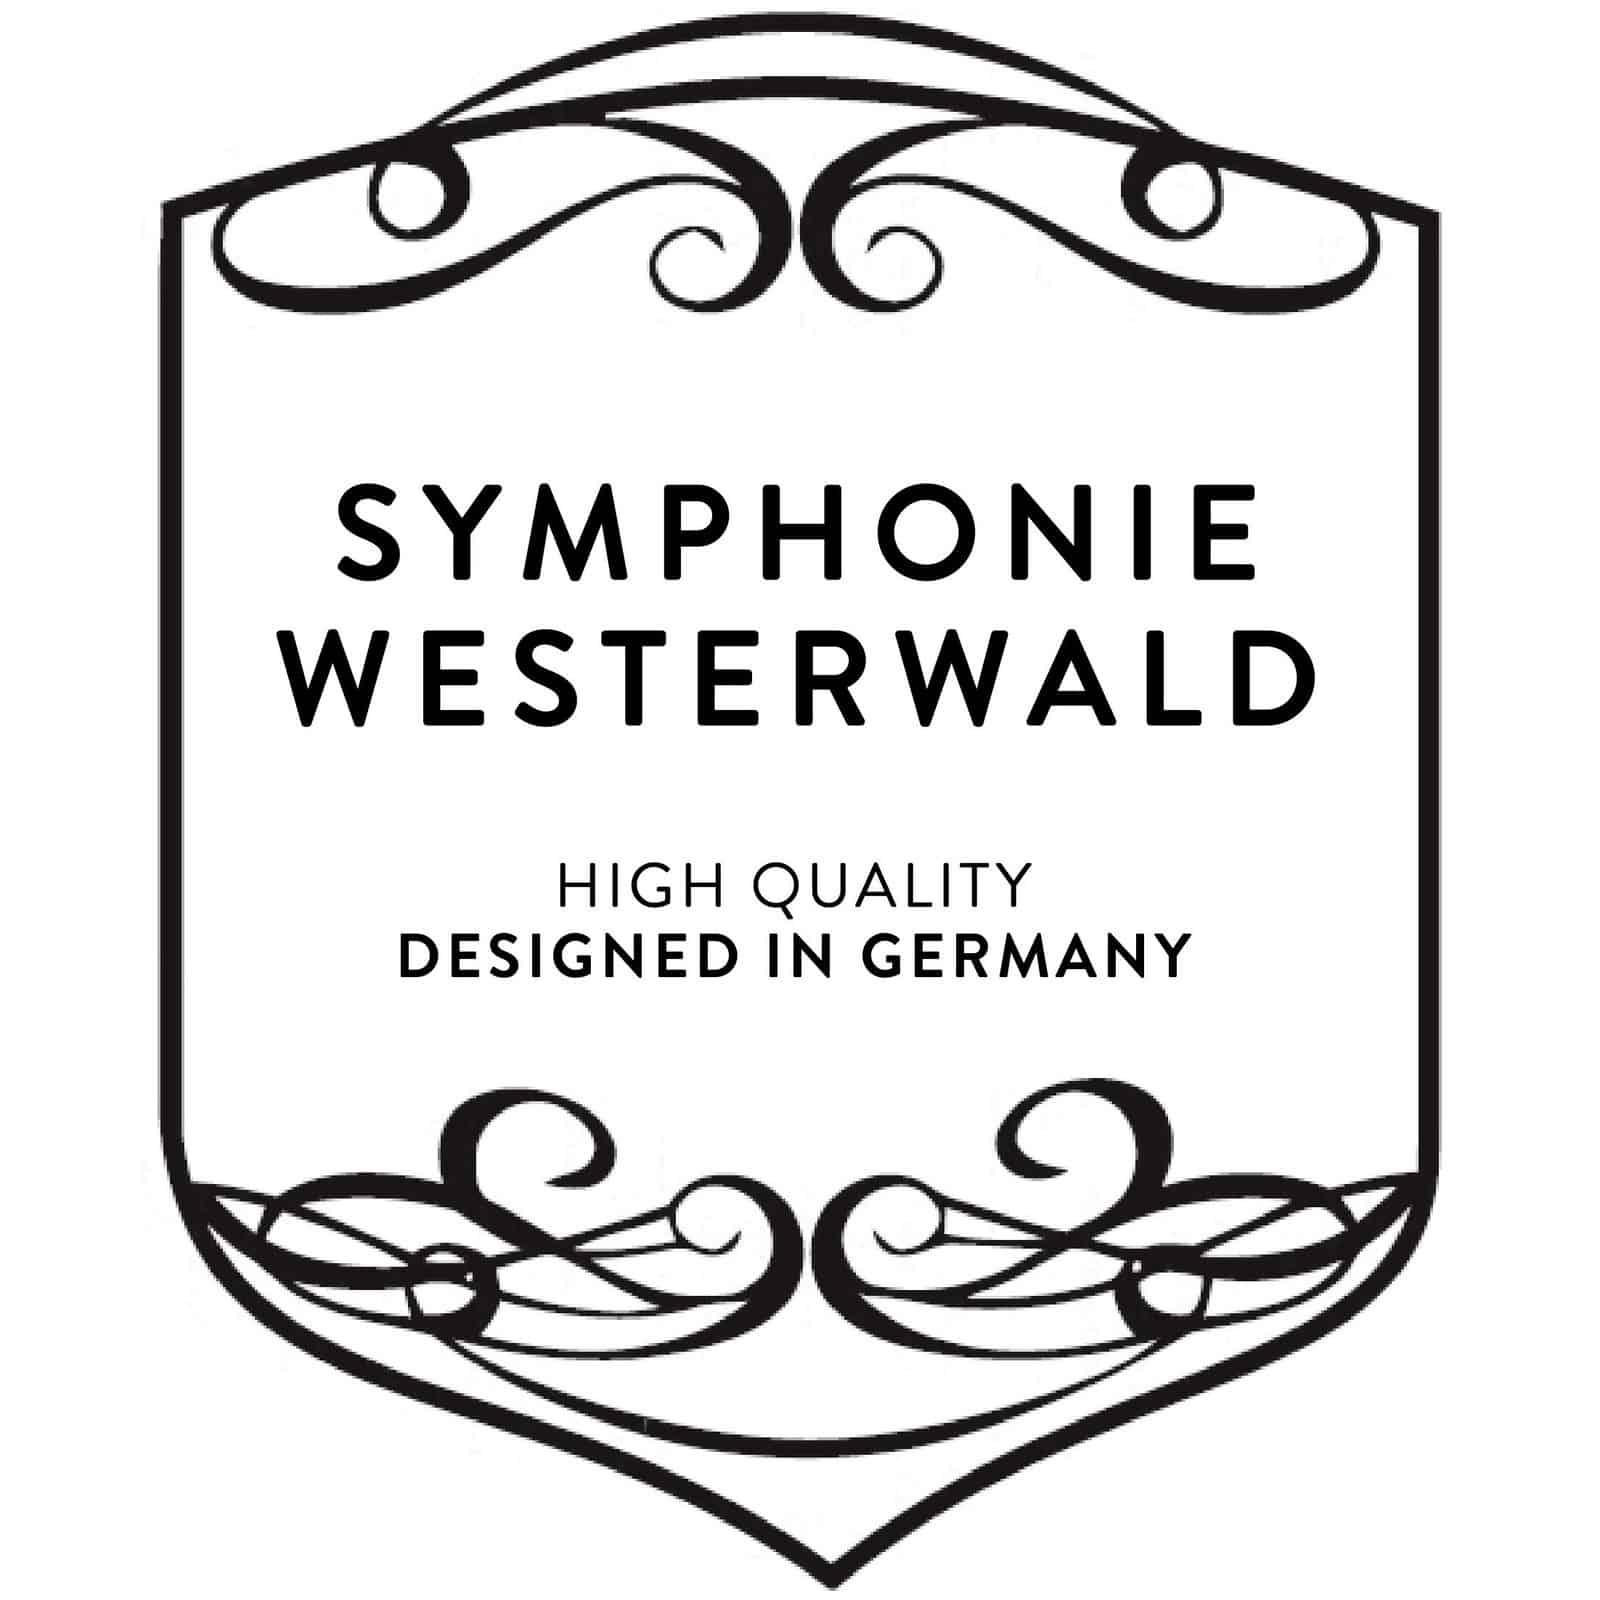 Waldhörner, Doppelhörner, Waldhorn, Doppelhorn, French Horns